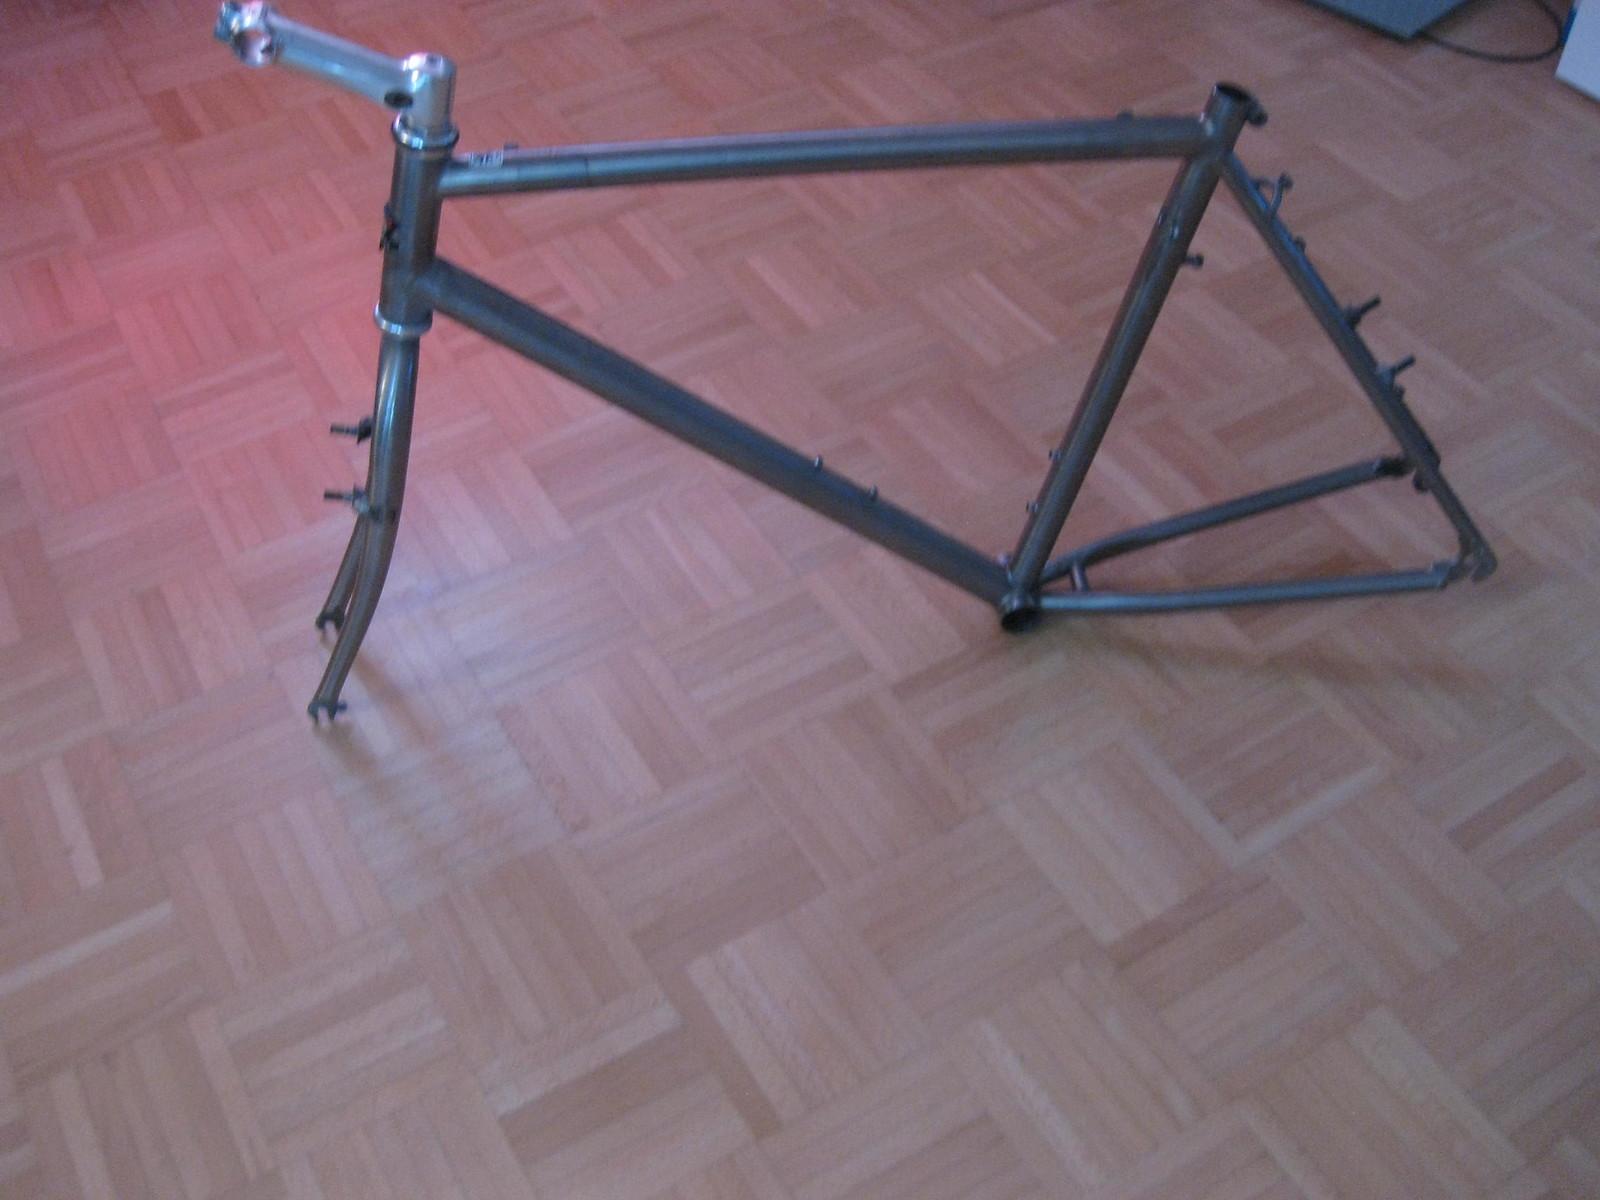 Titan Rahmen 26 Zoll Diamondback DBR TT? | Bikemarkt.MTB-News.de